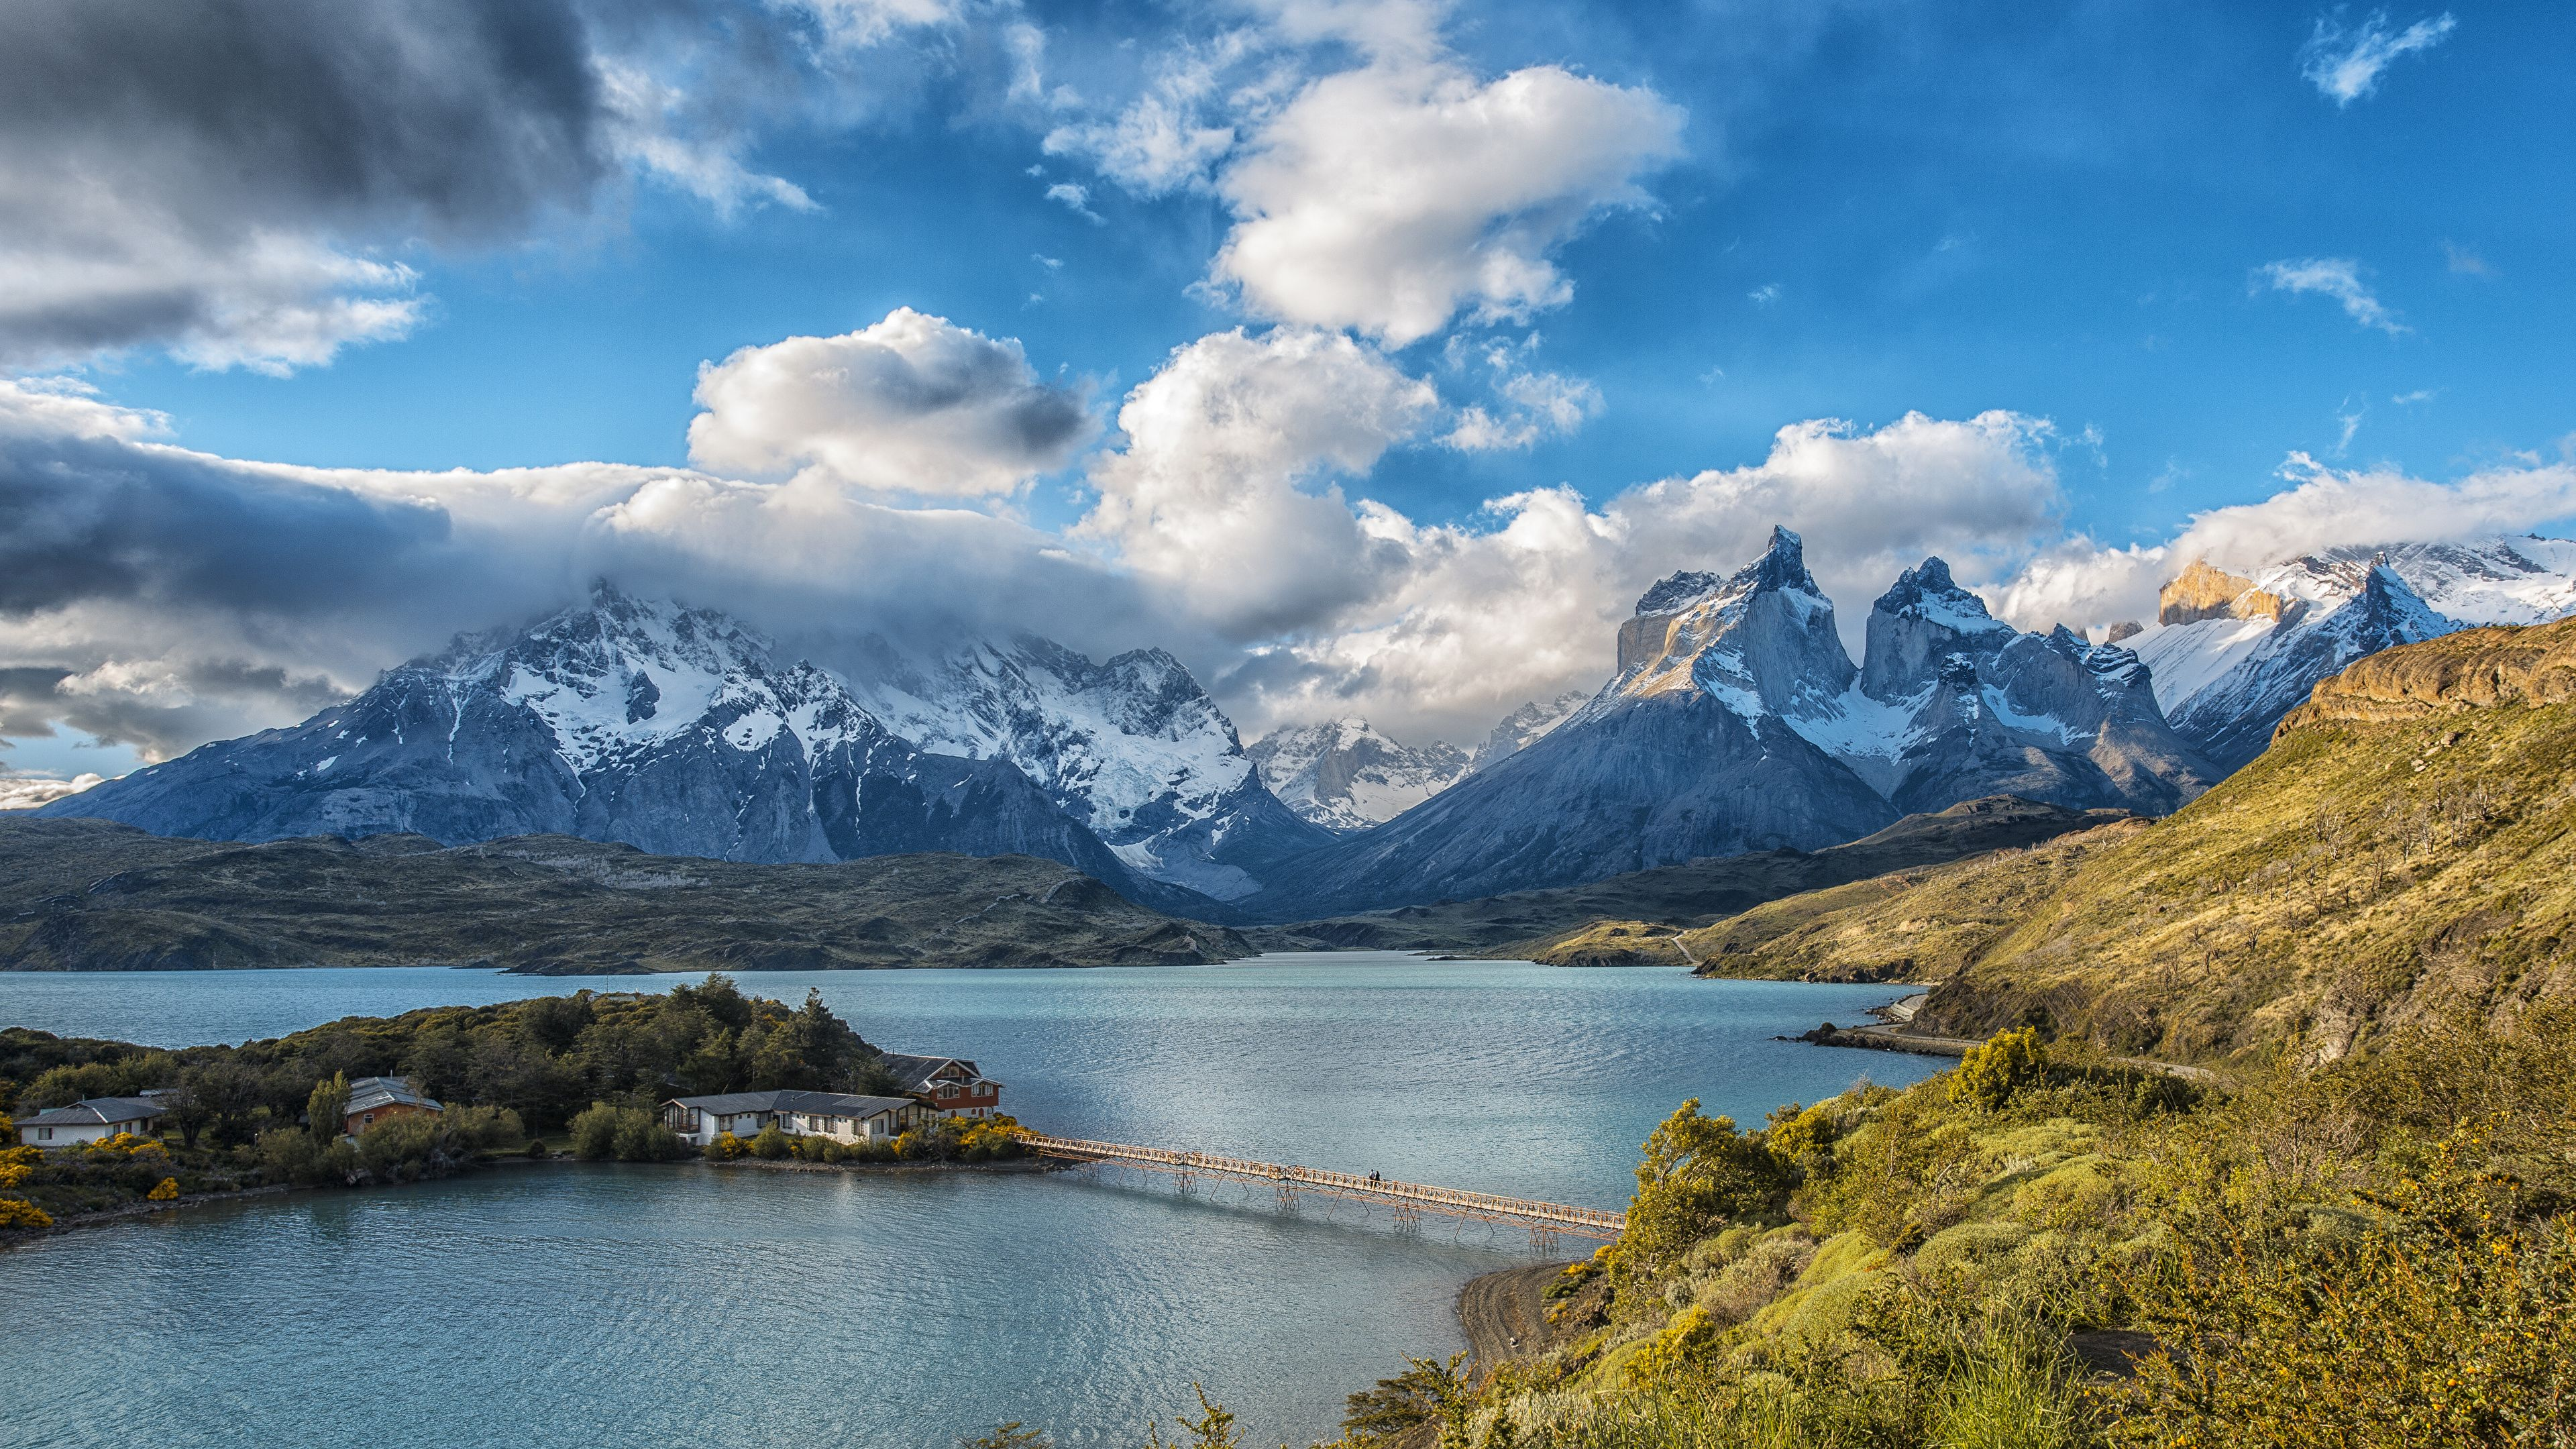 Fondo Escritorio Paisaje Nevada En Cumbre: Torres Del Paine National Park Wallpapers